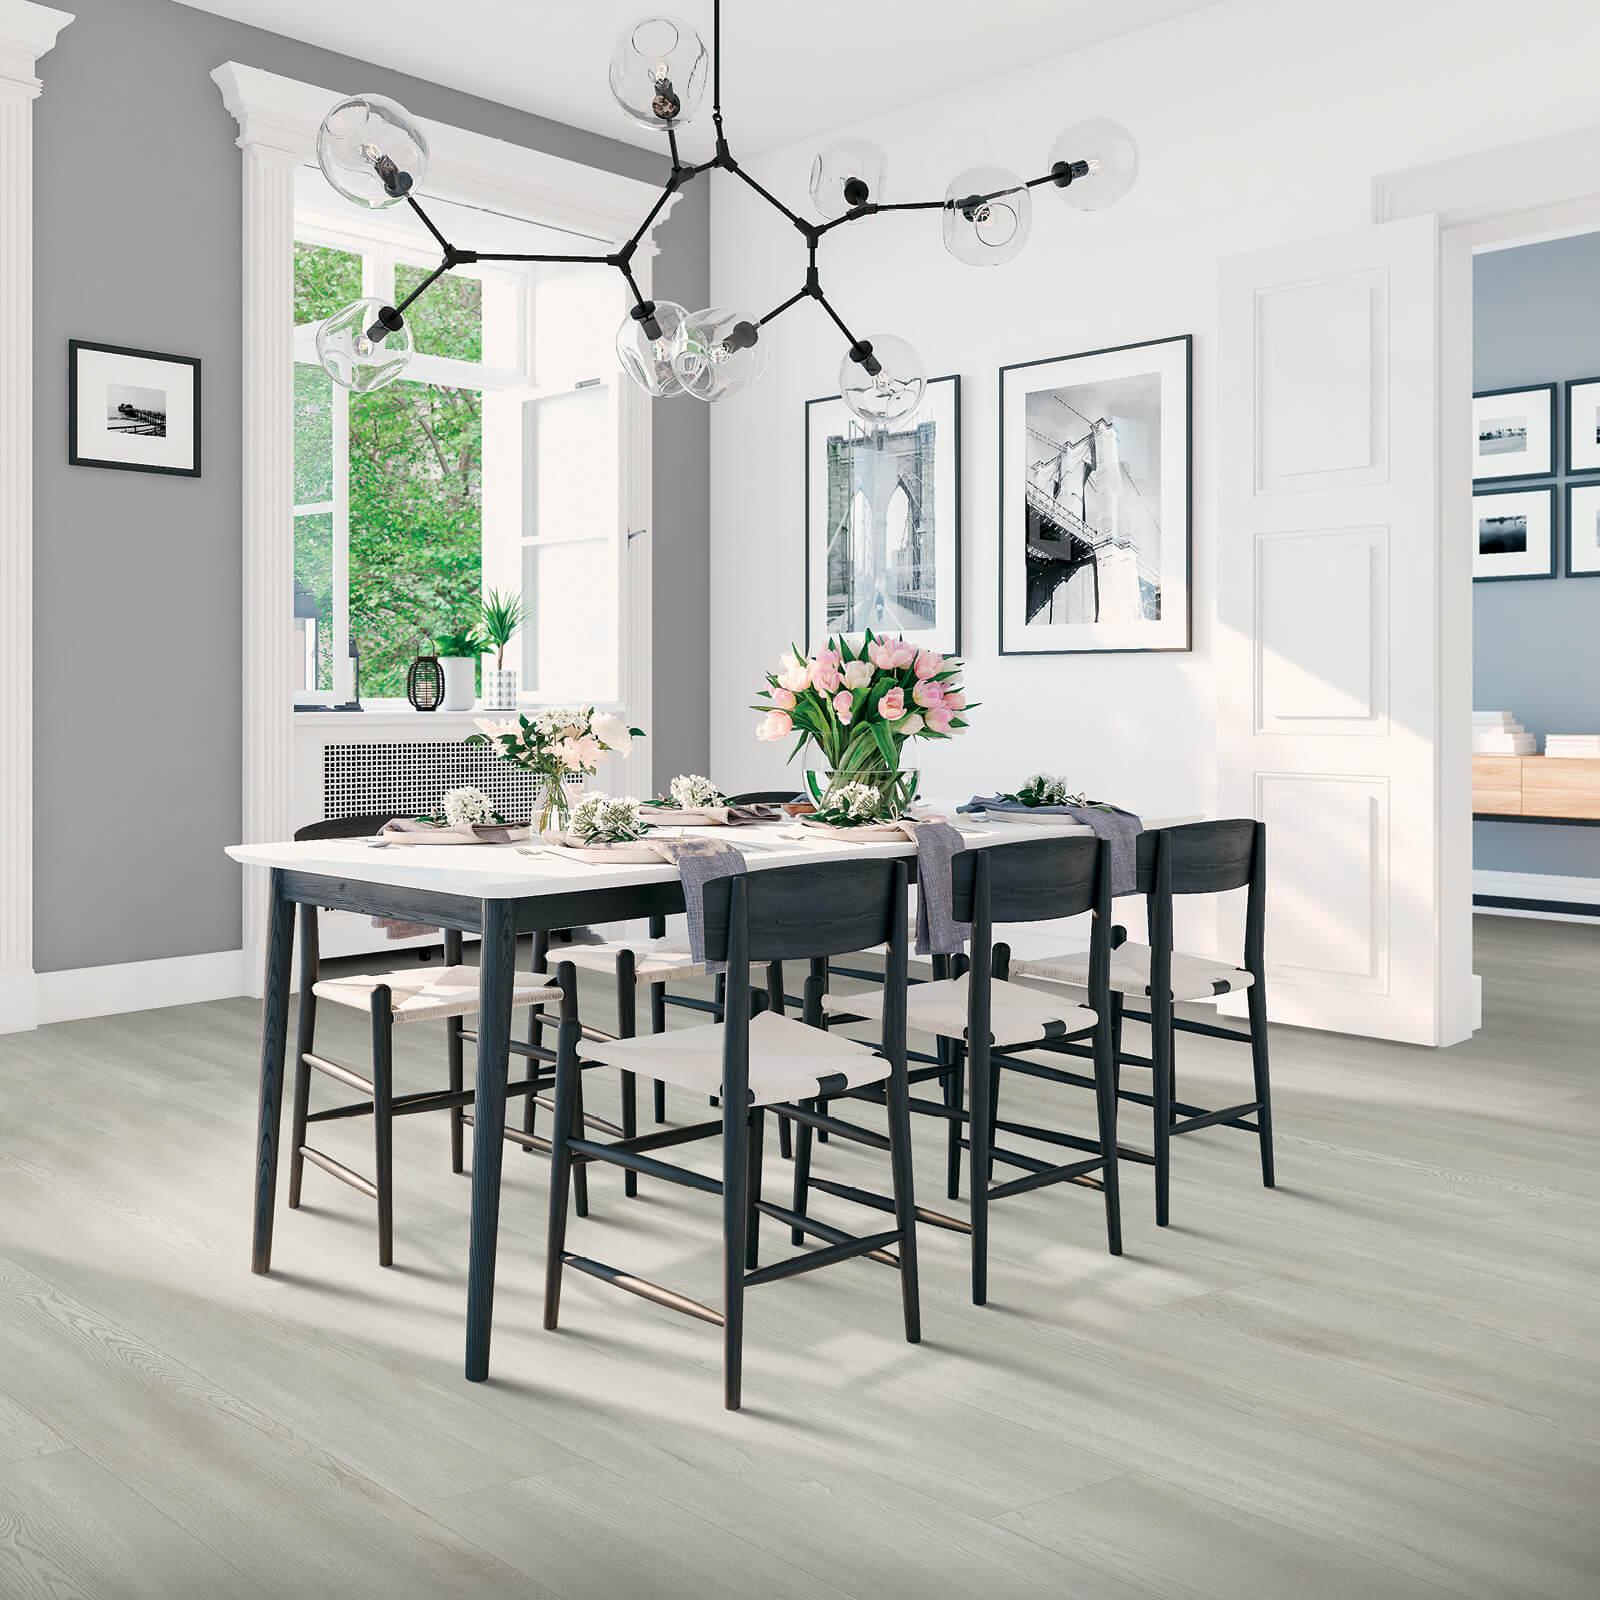 Dining room interior | Dolphin Carpet & Tile